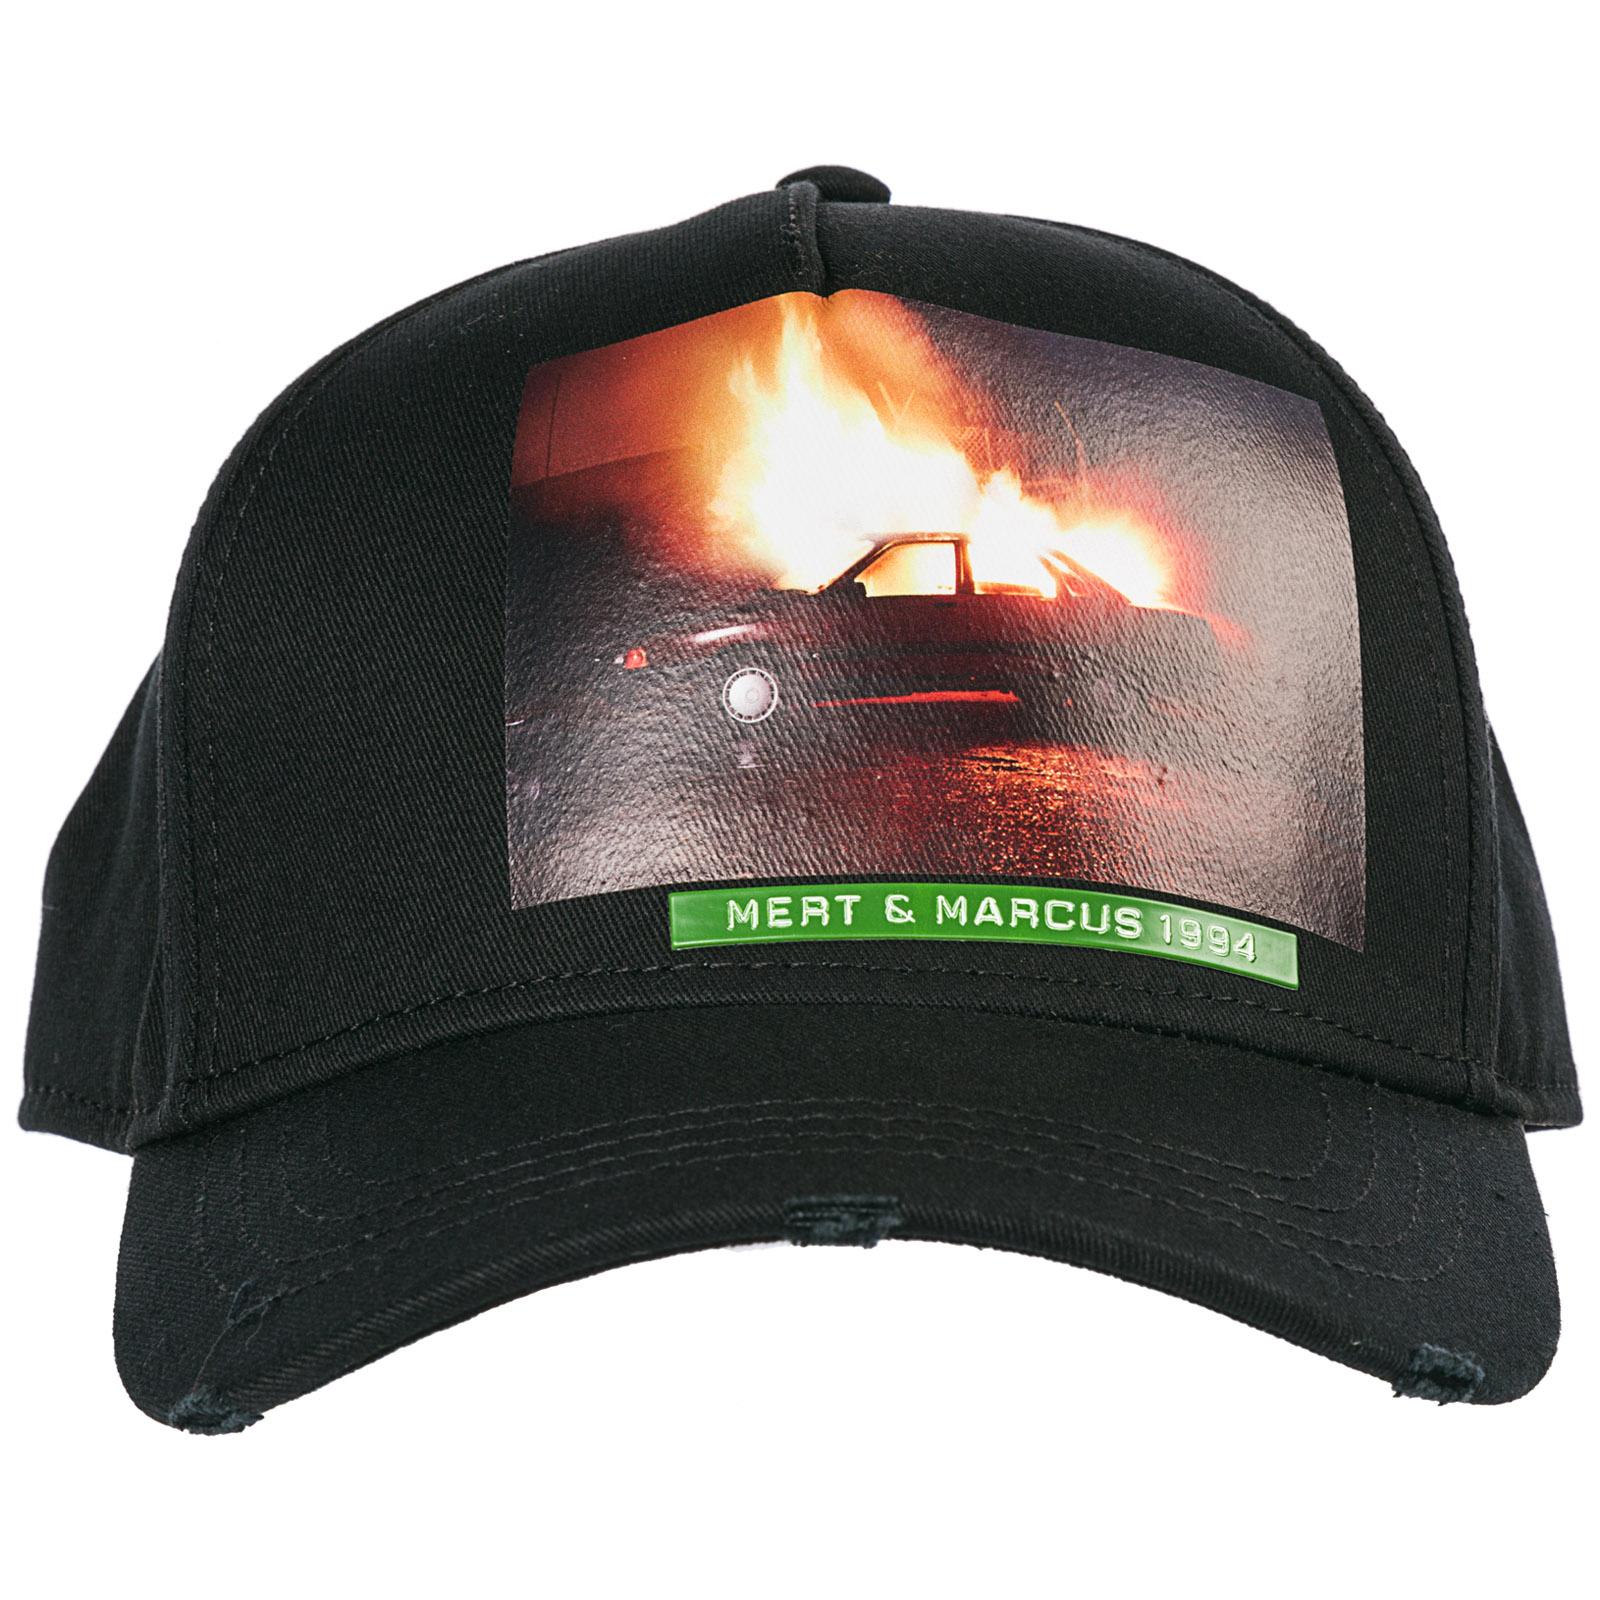 Cappello baseball Dsquared2 Mert   Marcus BCM020608C000012124 nero ... b6ac997b3482